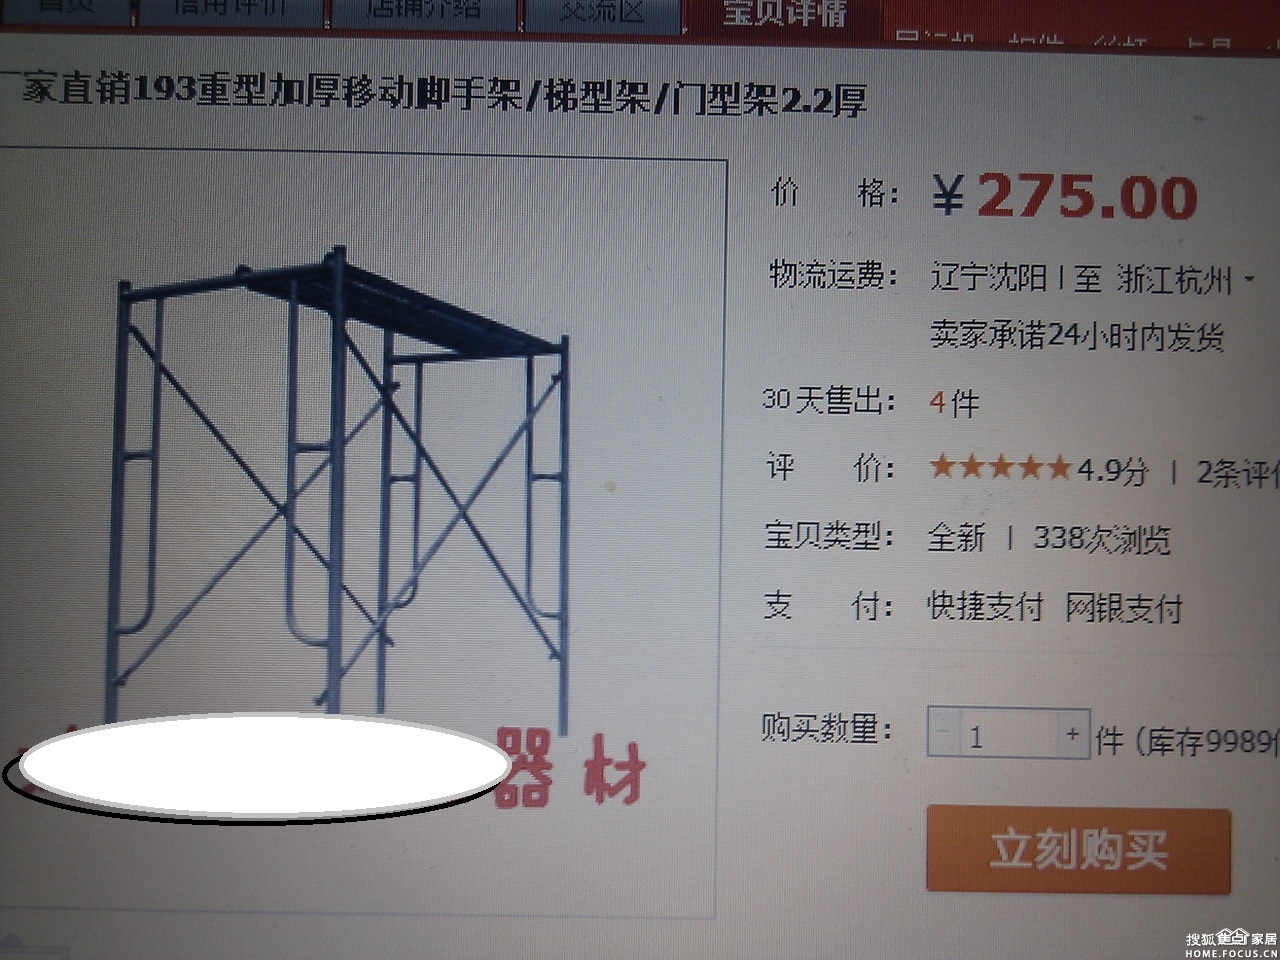 img_20130714_22124822-沈阳装修论坛-搜狐家居网